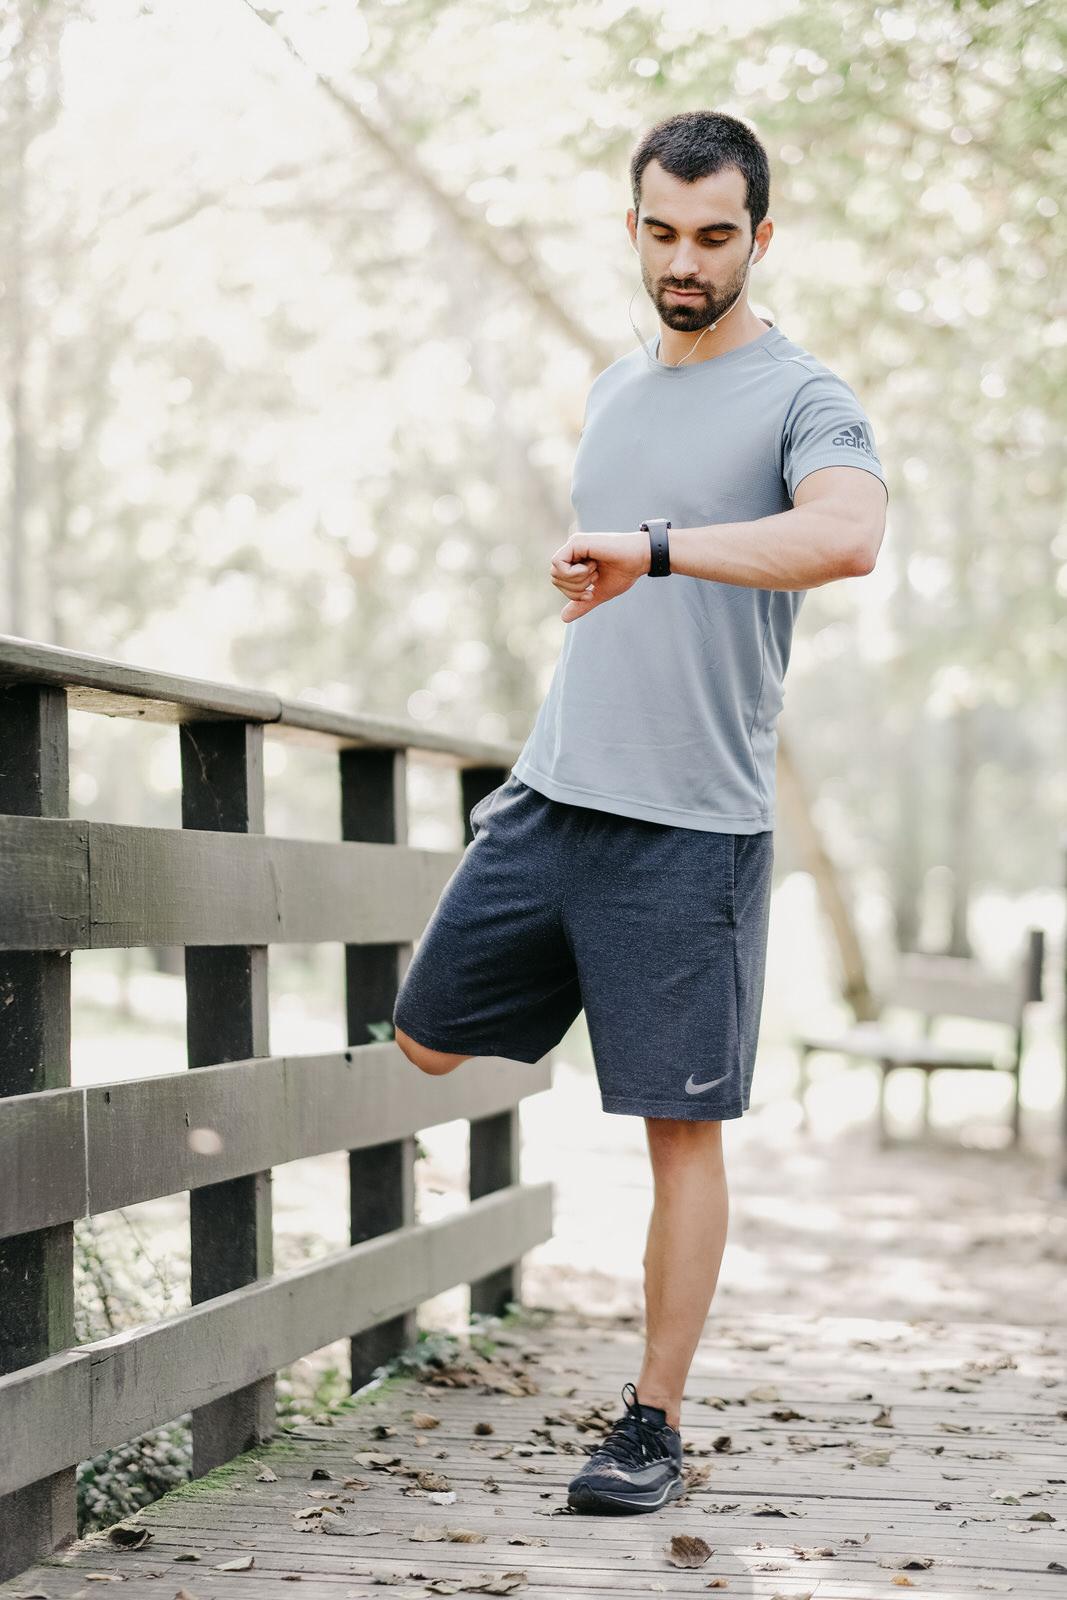 Fotografo de moda e produto para ecommerce porto desporto calcado sapatilhas adidas nike rebook